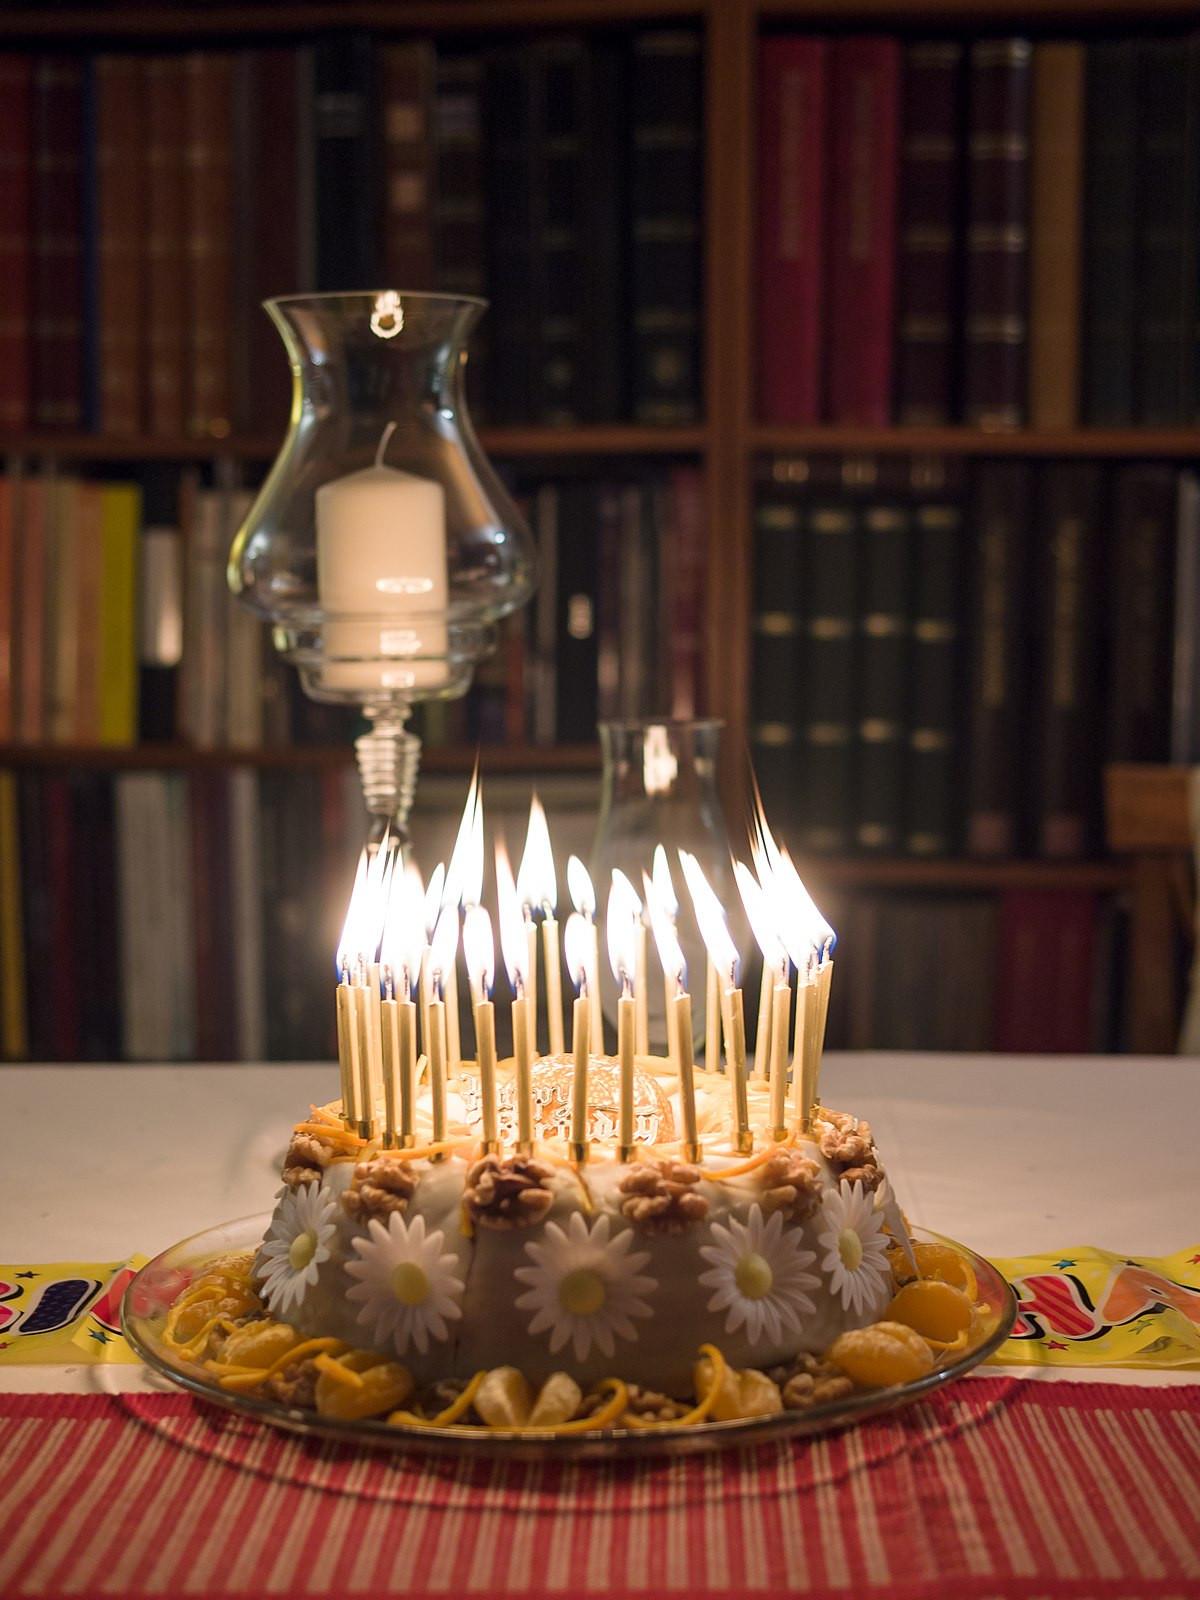 When Did Adding Candles To The Birthday Cake Originated  Birthday cake